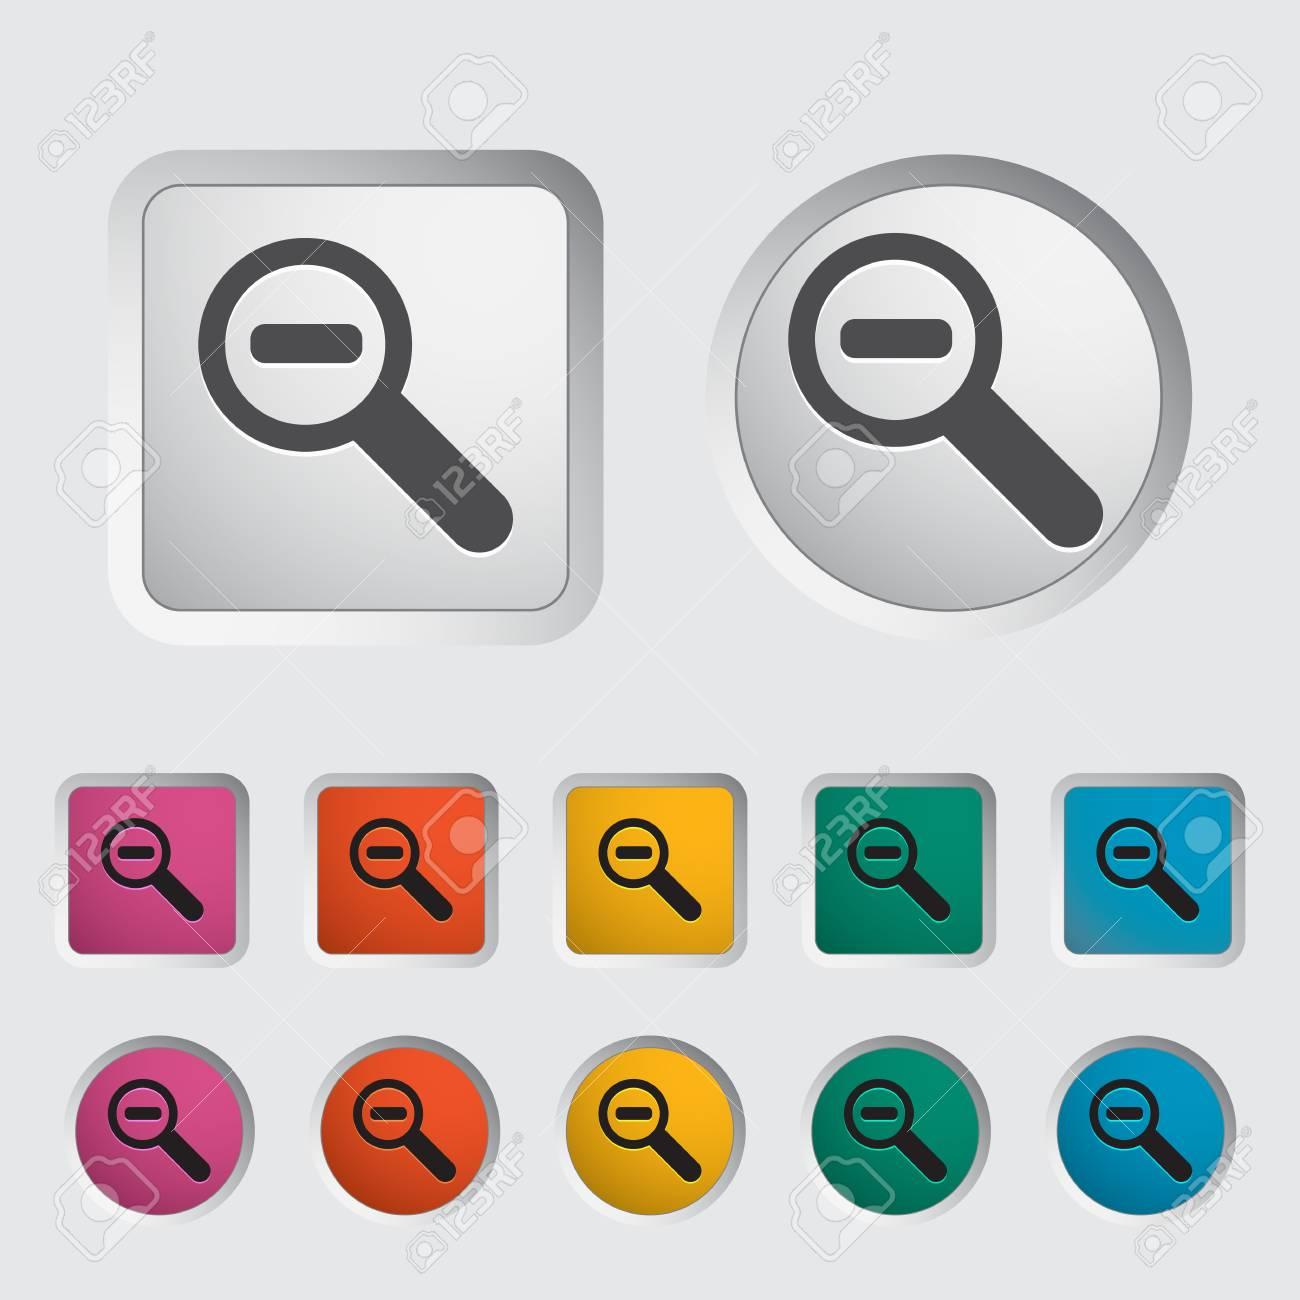 Scale single icon. Vector illustration. Stock Vector - 17355267